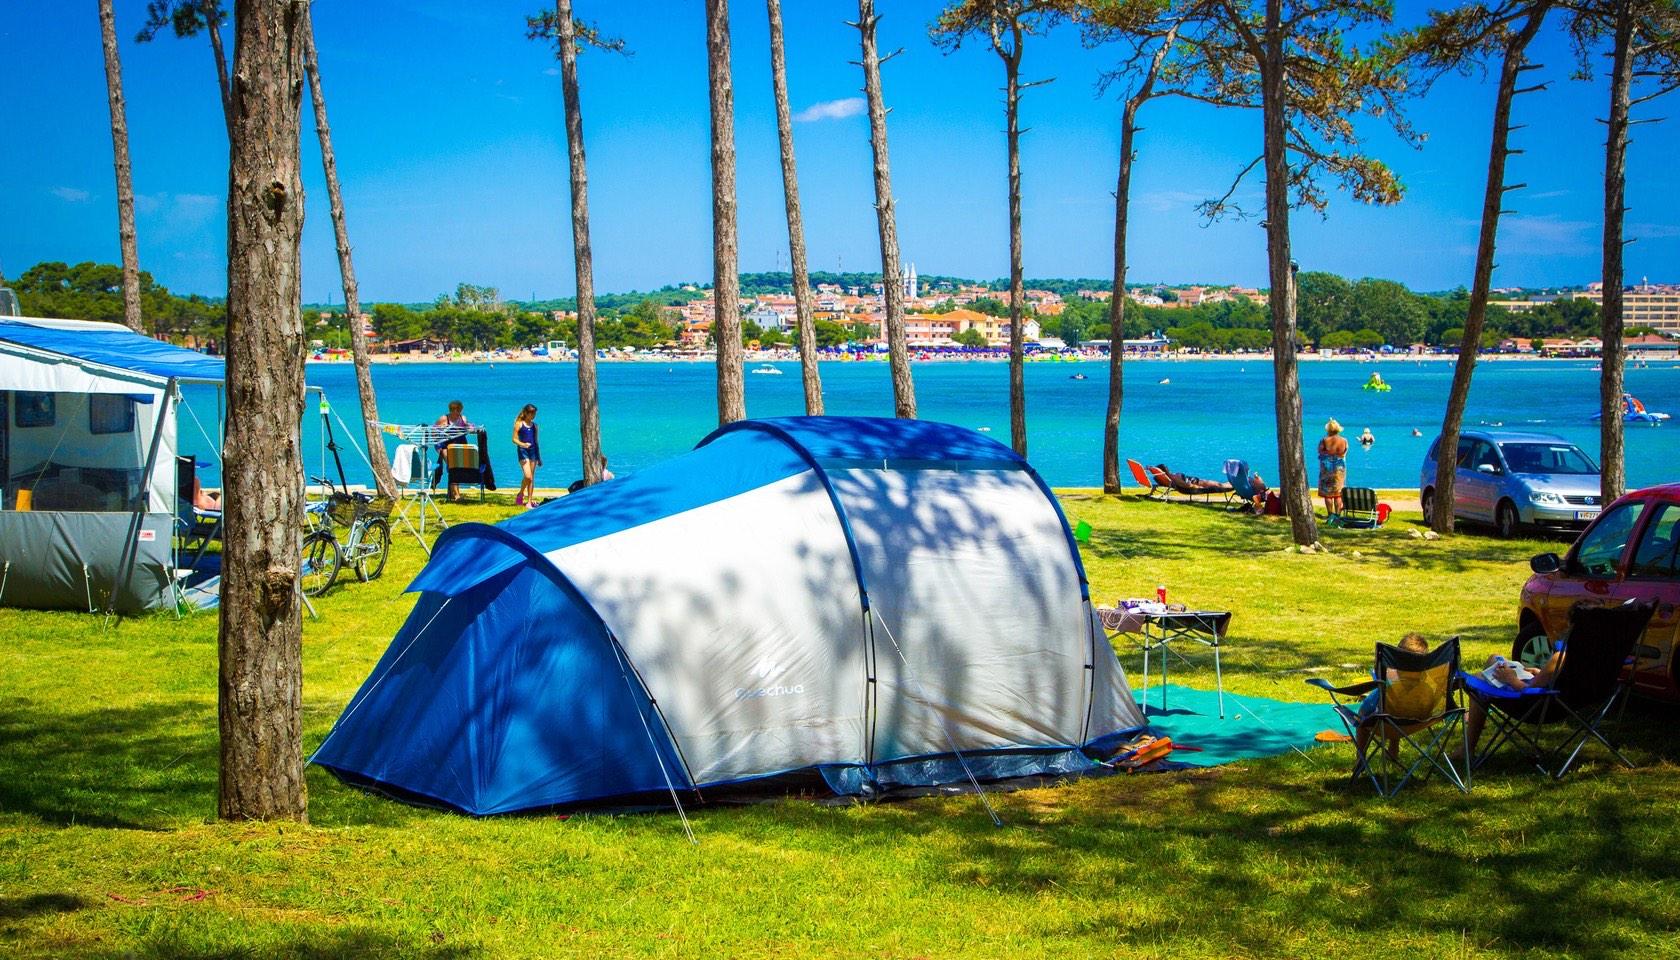 Camping Karta Europa.Arena Medulin Campsite Campsite In Medulin Arenacampsites